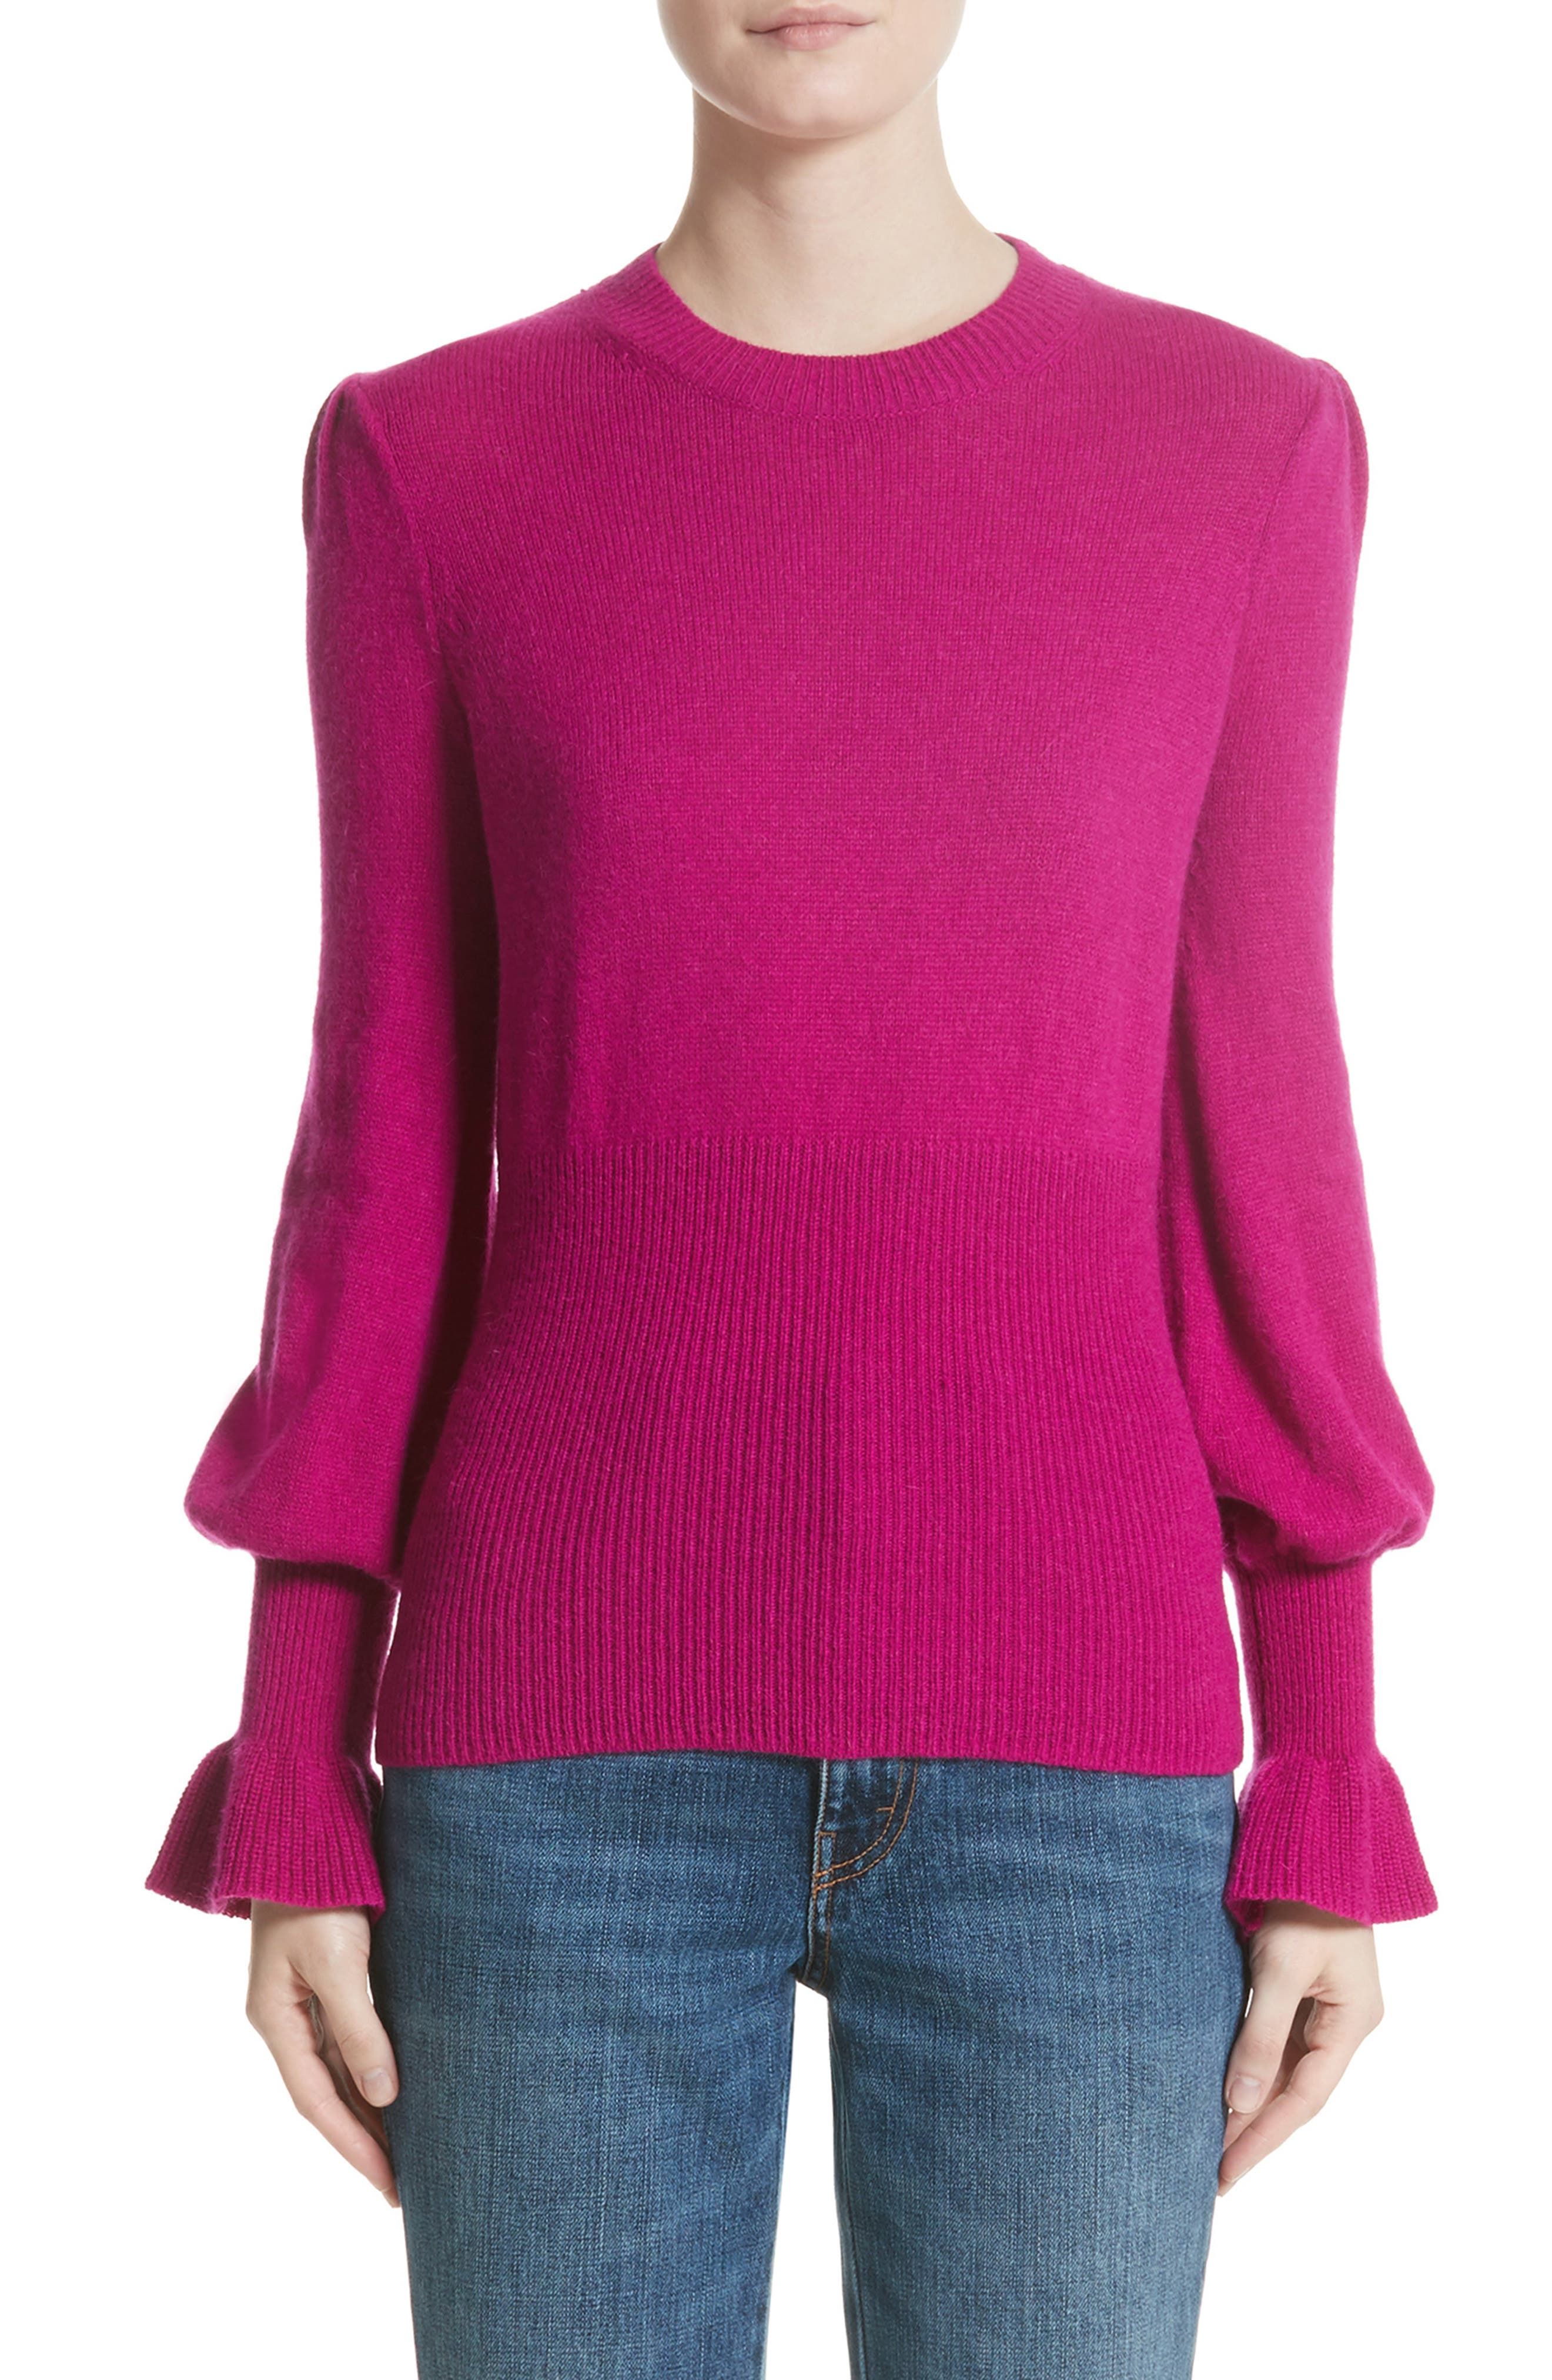 Alternate Image 1 Selected - Co Flare Cuff Alpaca Blend Sweater